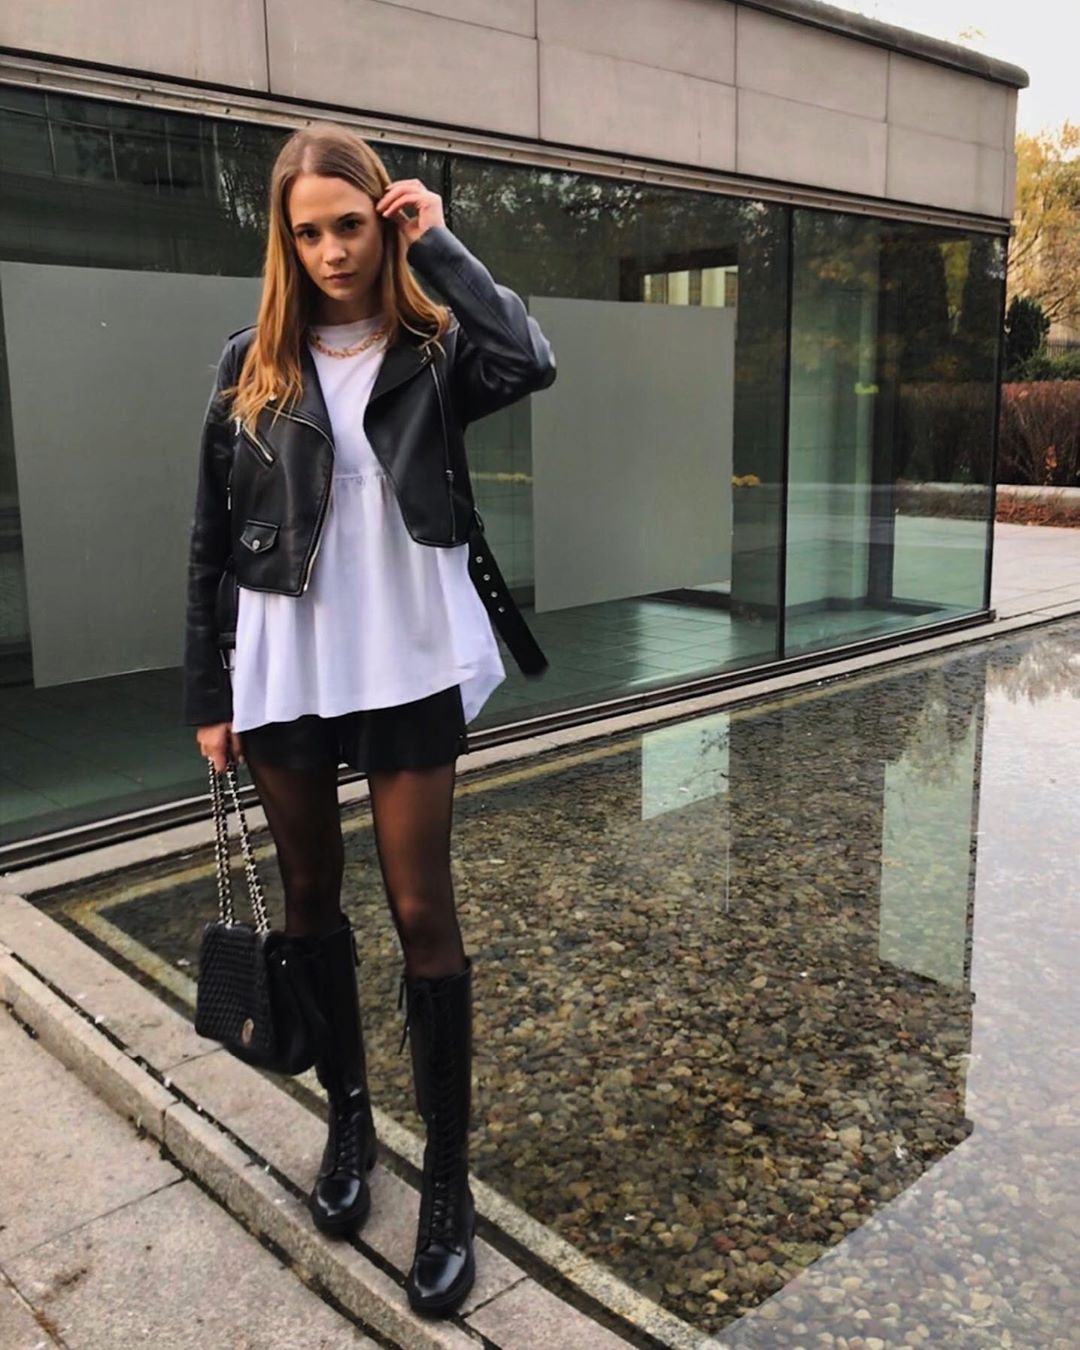 lace-up flat boots de Zara sur adaszymala